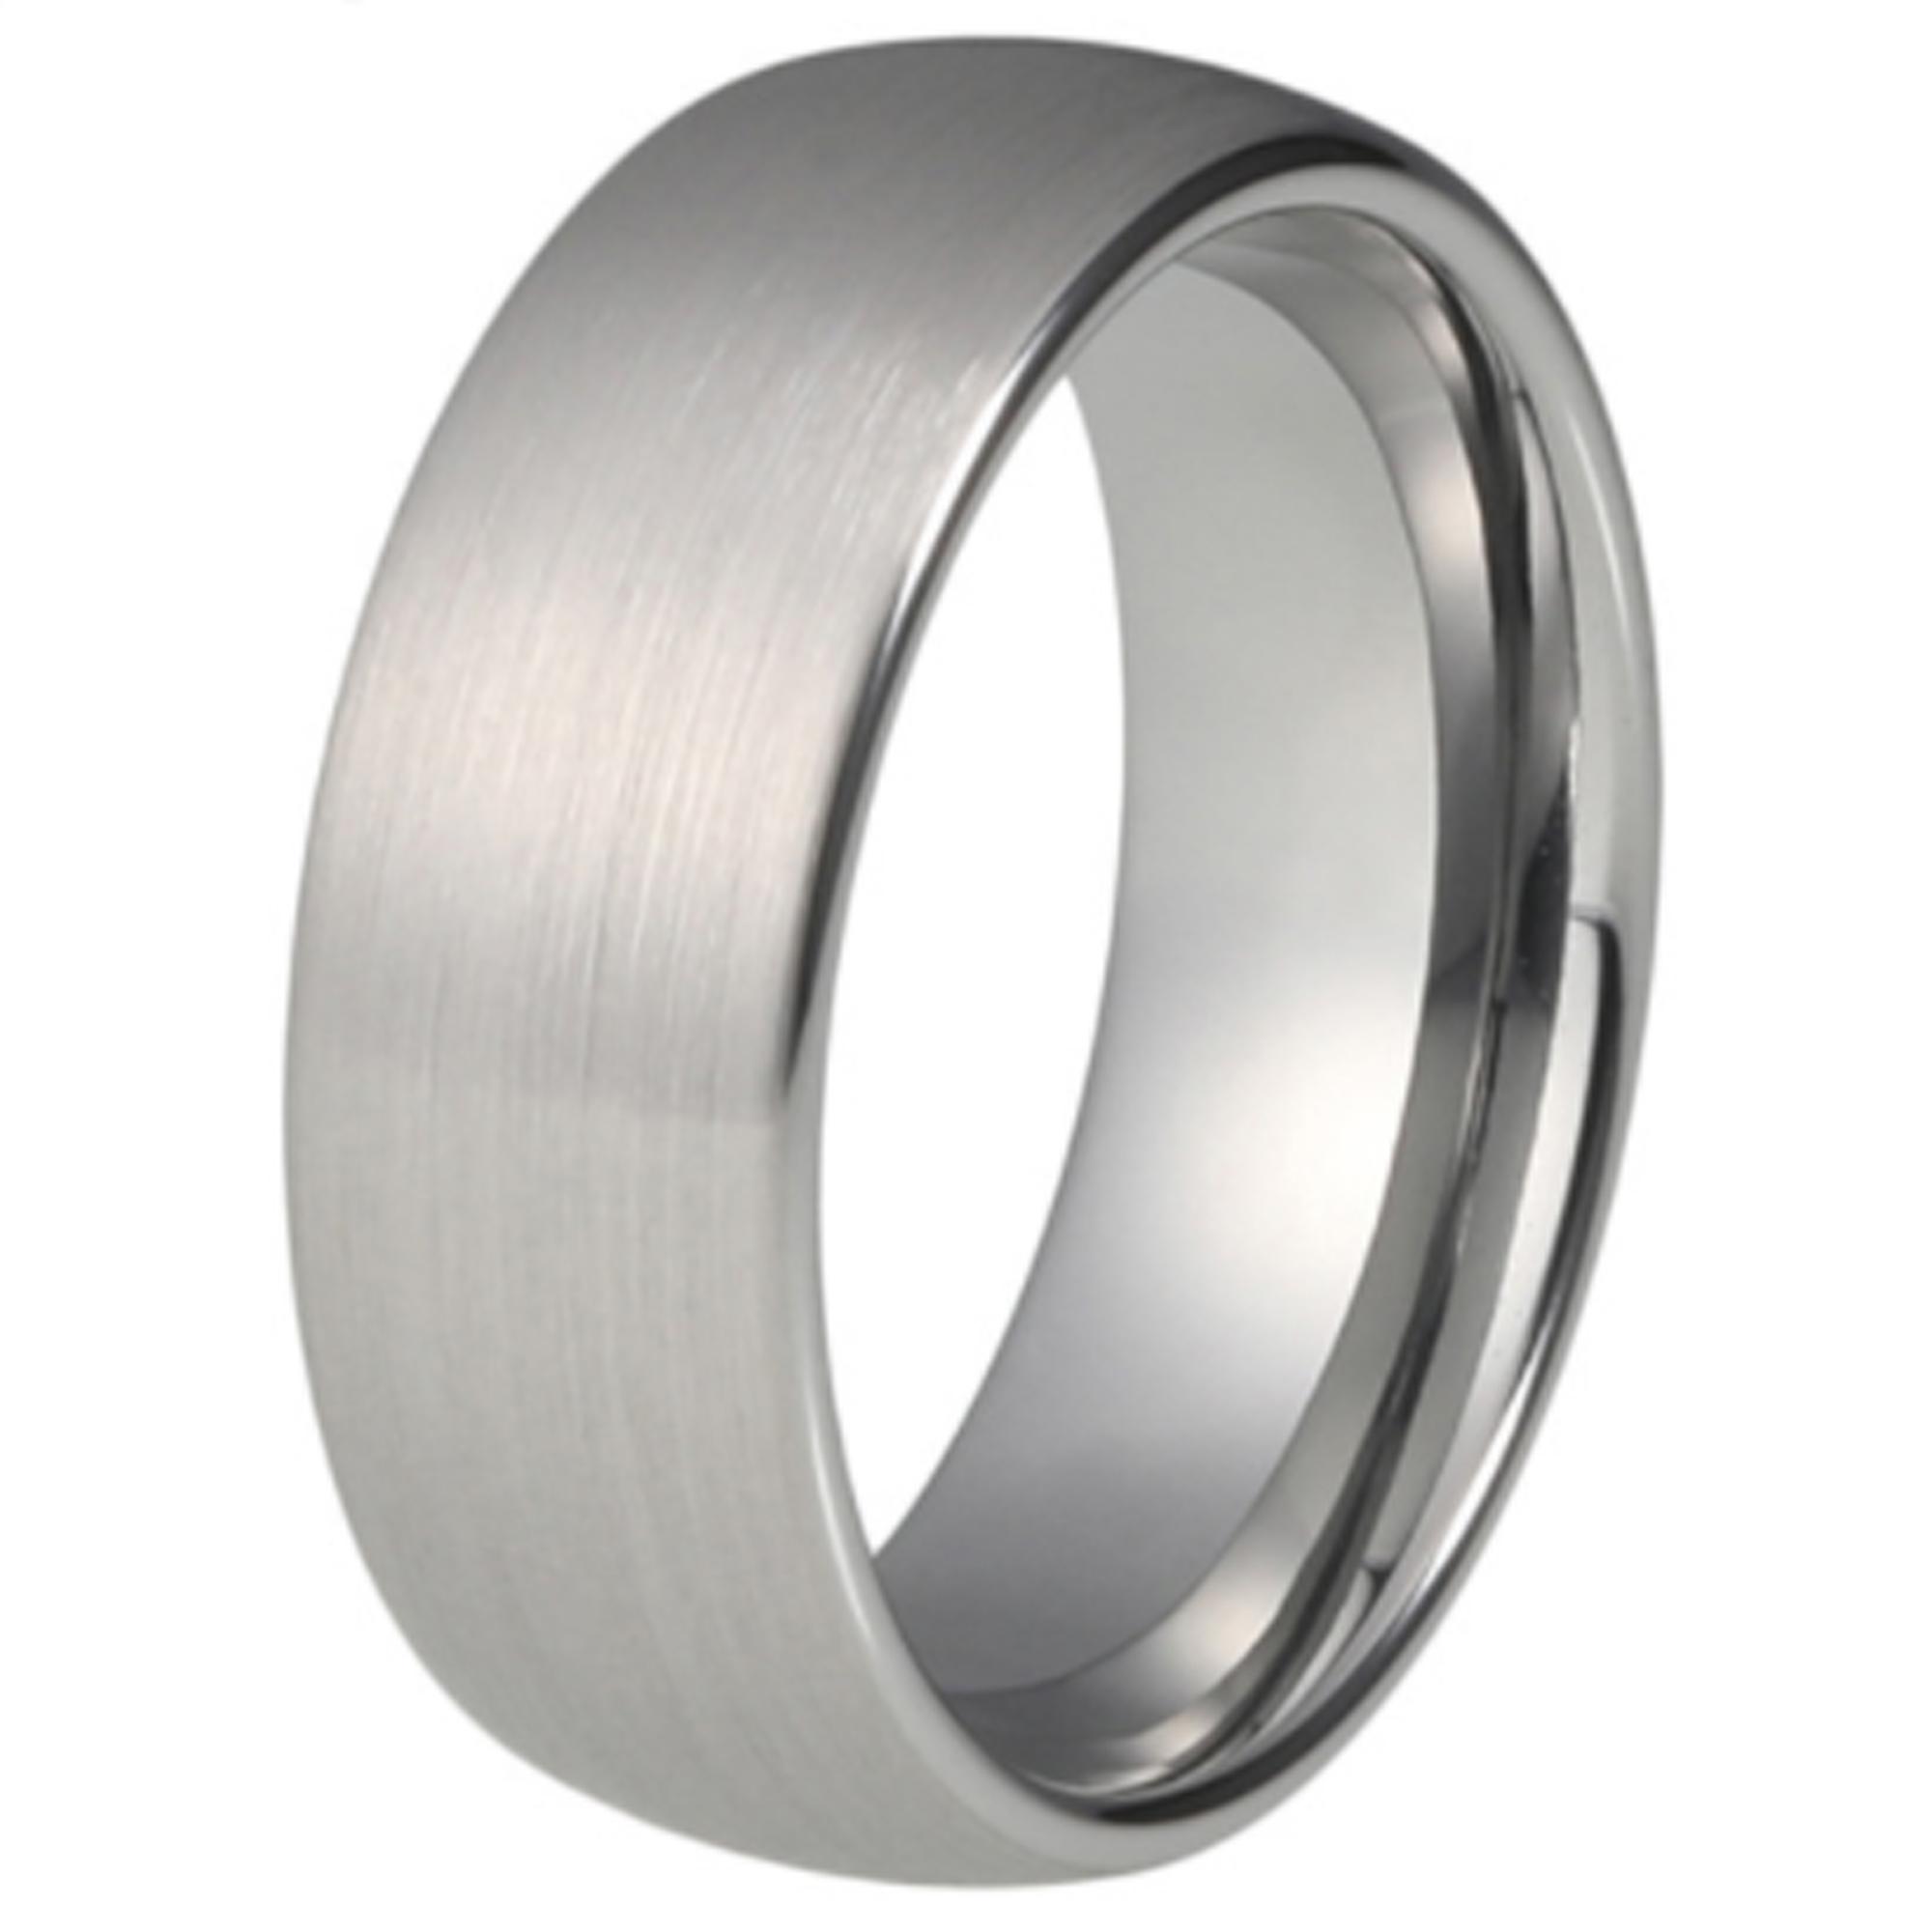 8mm Tungsten Carbide Mens Wedding Band Womens Silver Ring Uk Z 1 2